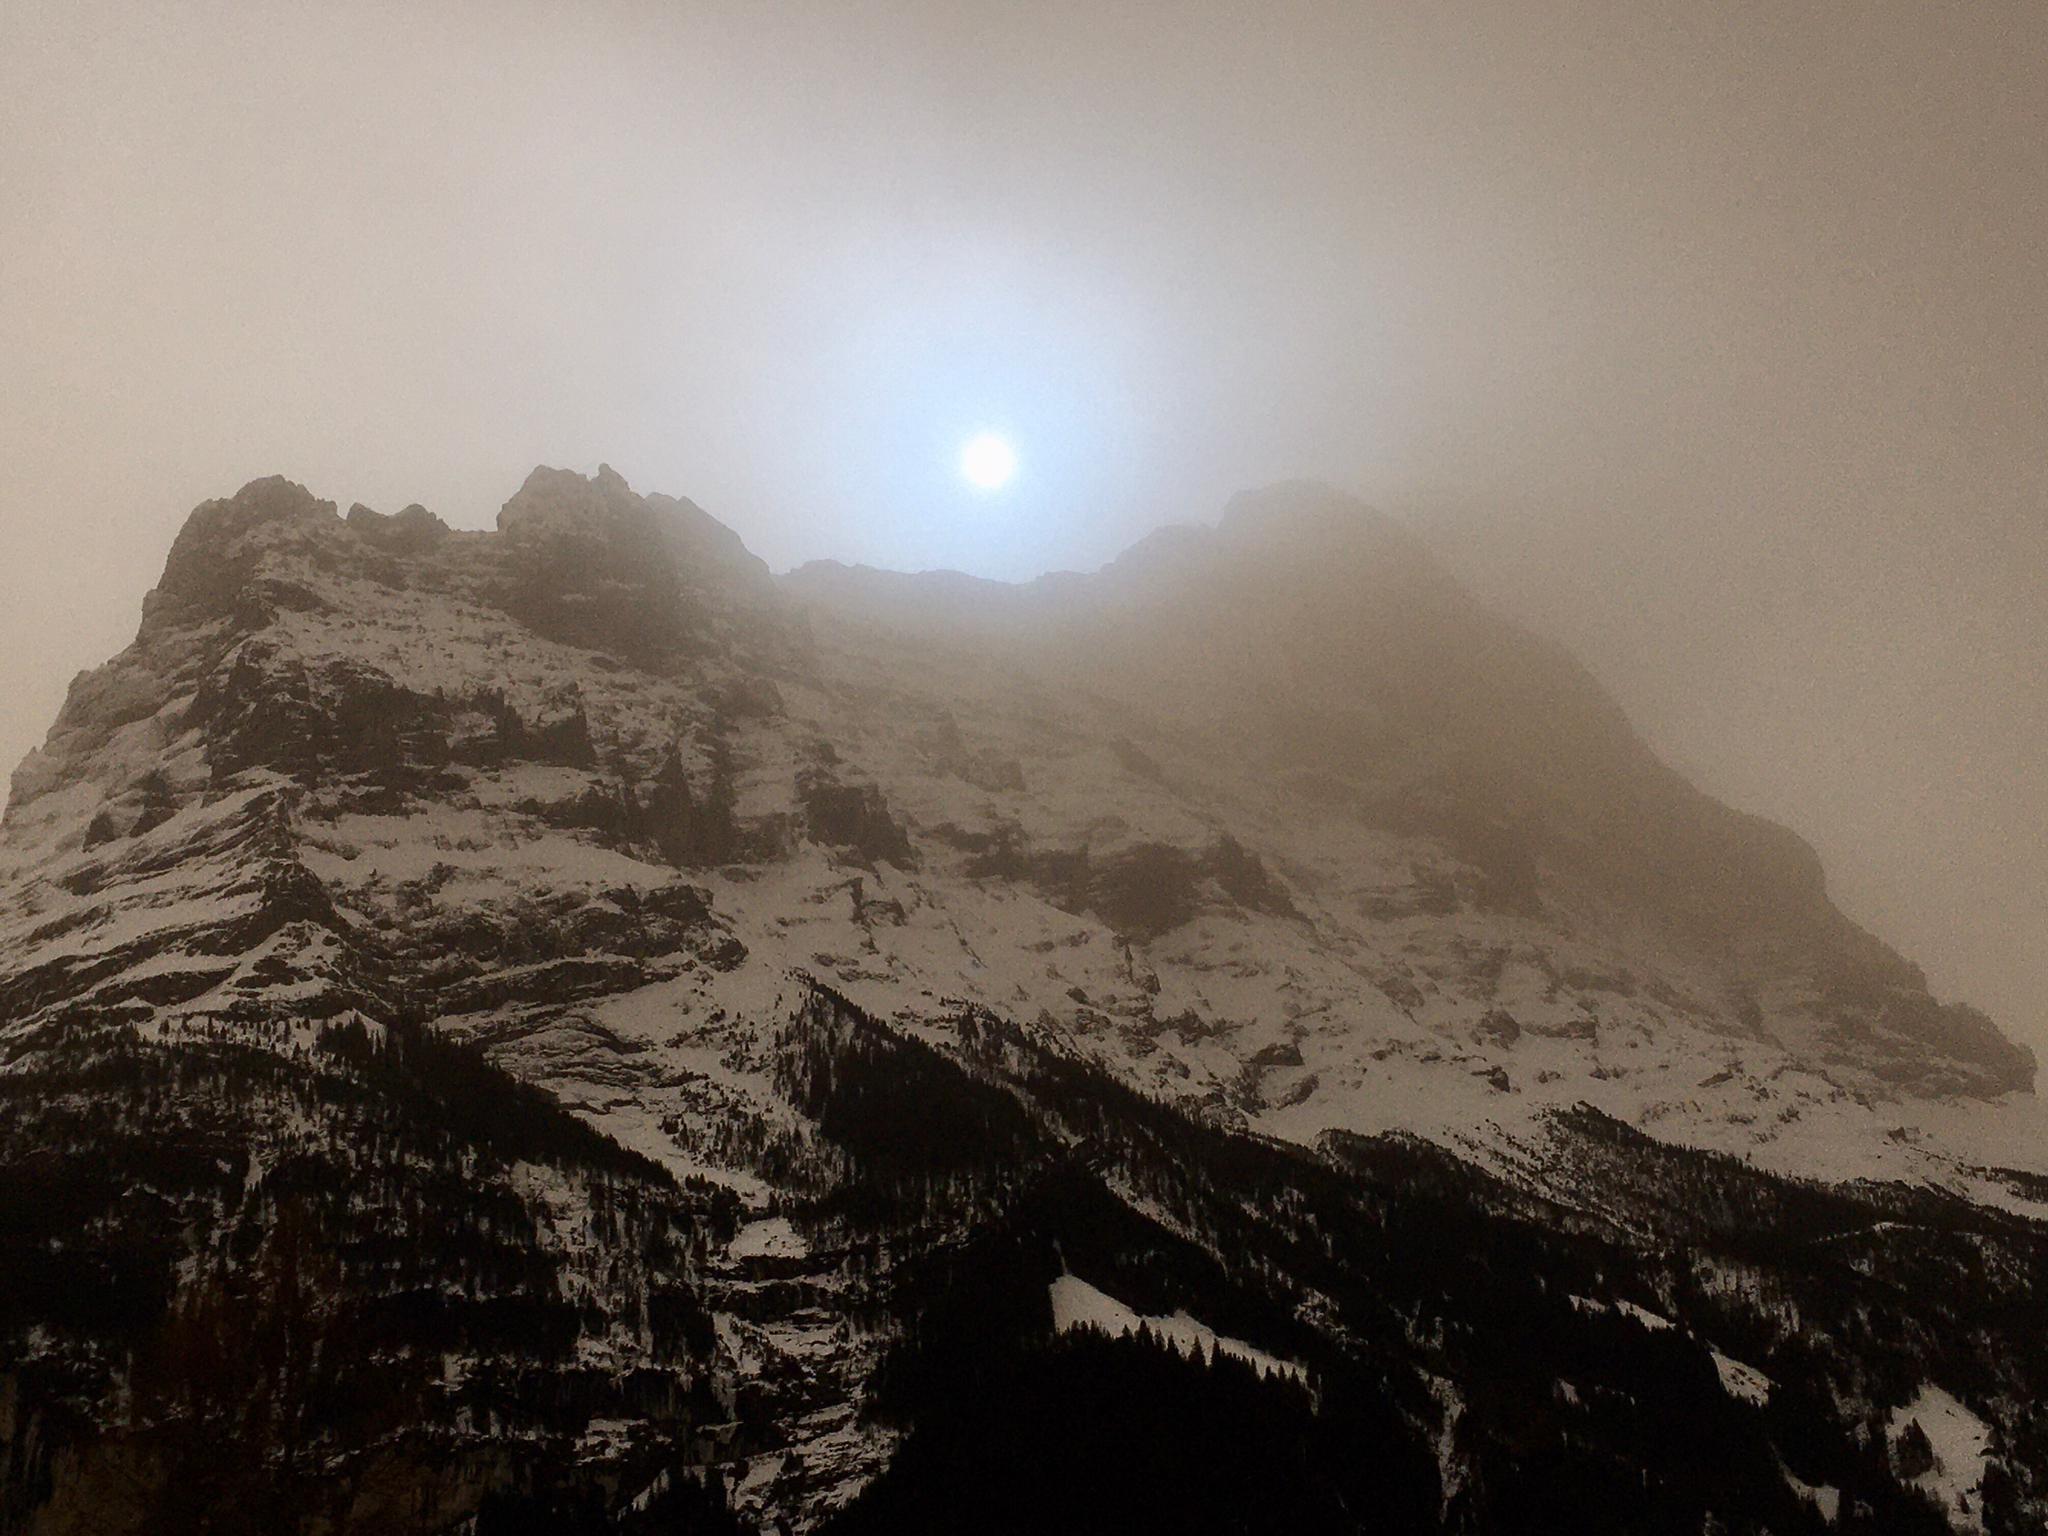 Sahara dust in Grindelwald - Chalet Anemone